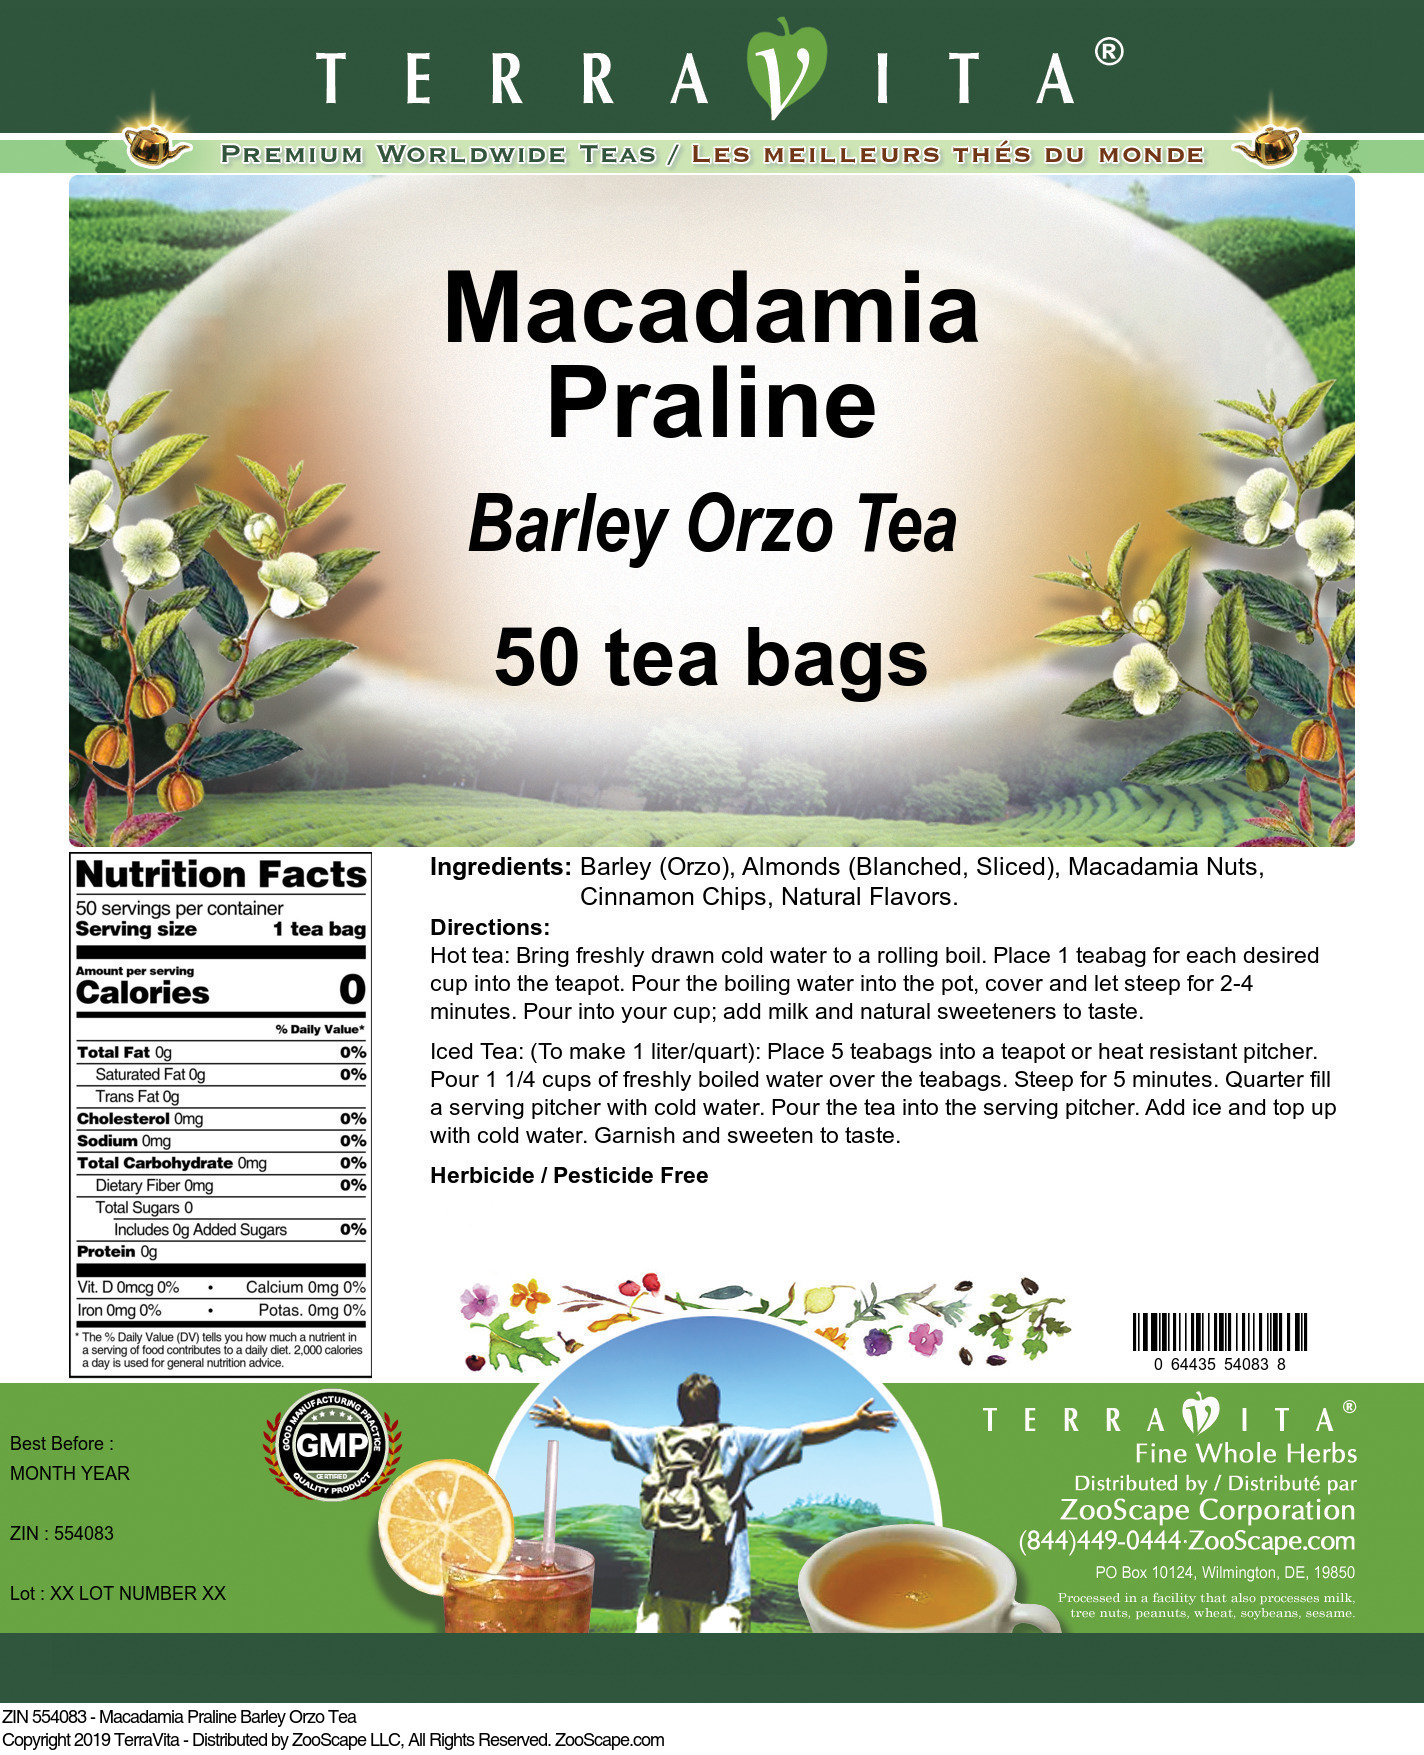 Macadamia Praline Barley Orzo Tea